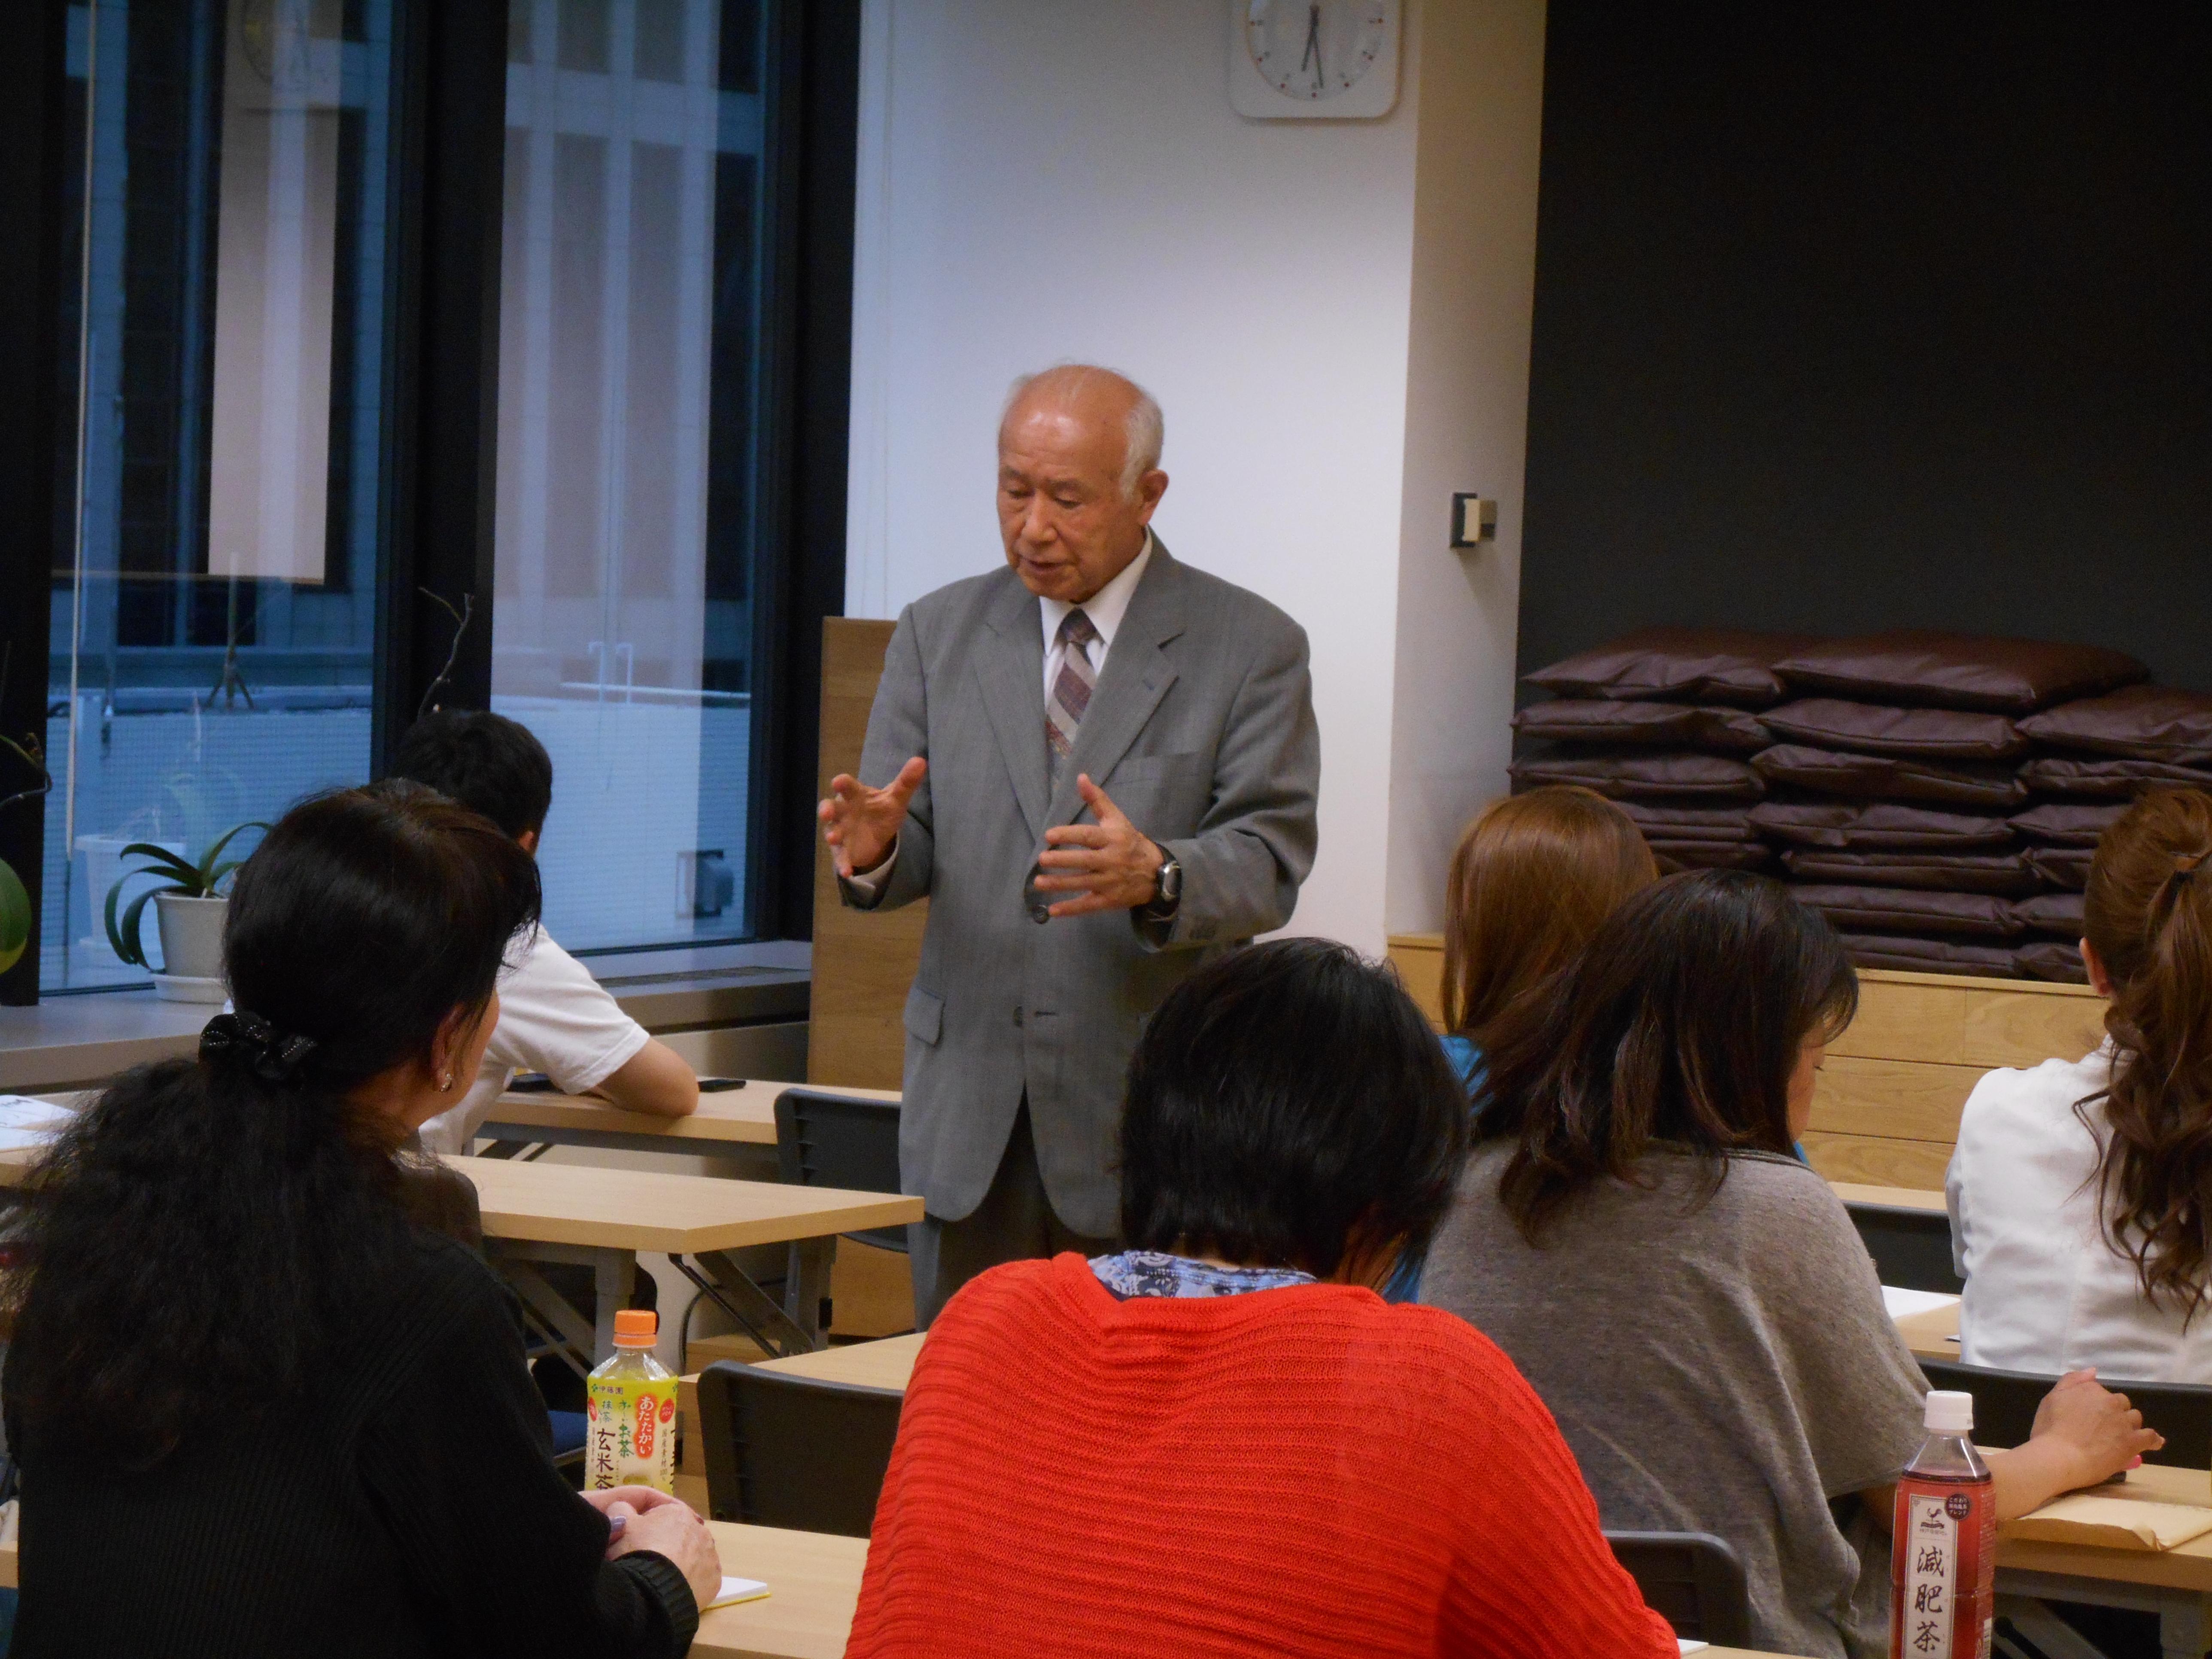 DSCN1708 - 4月1日東京思風塾の開催になります。